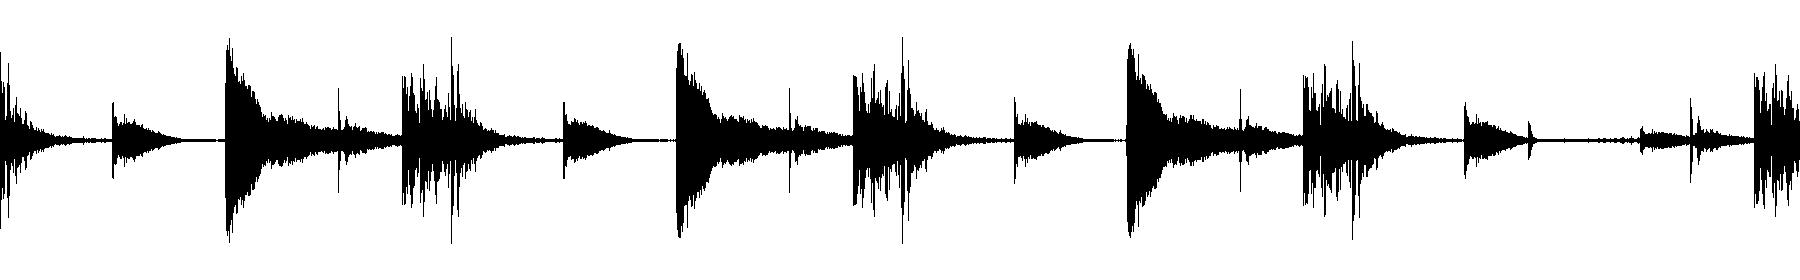 g abs05 010